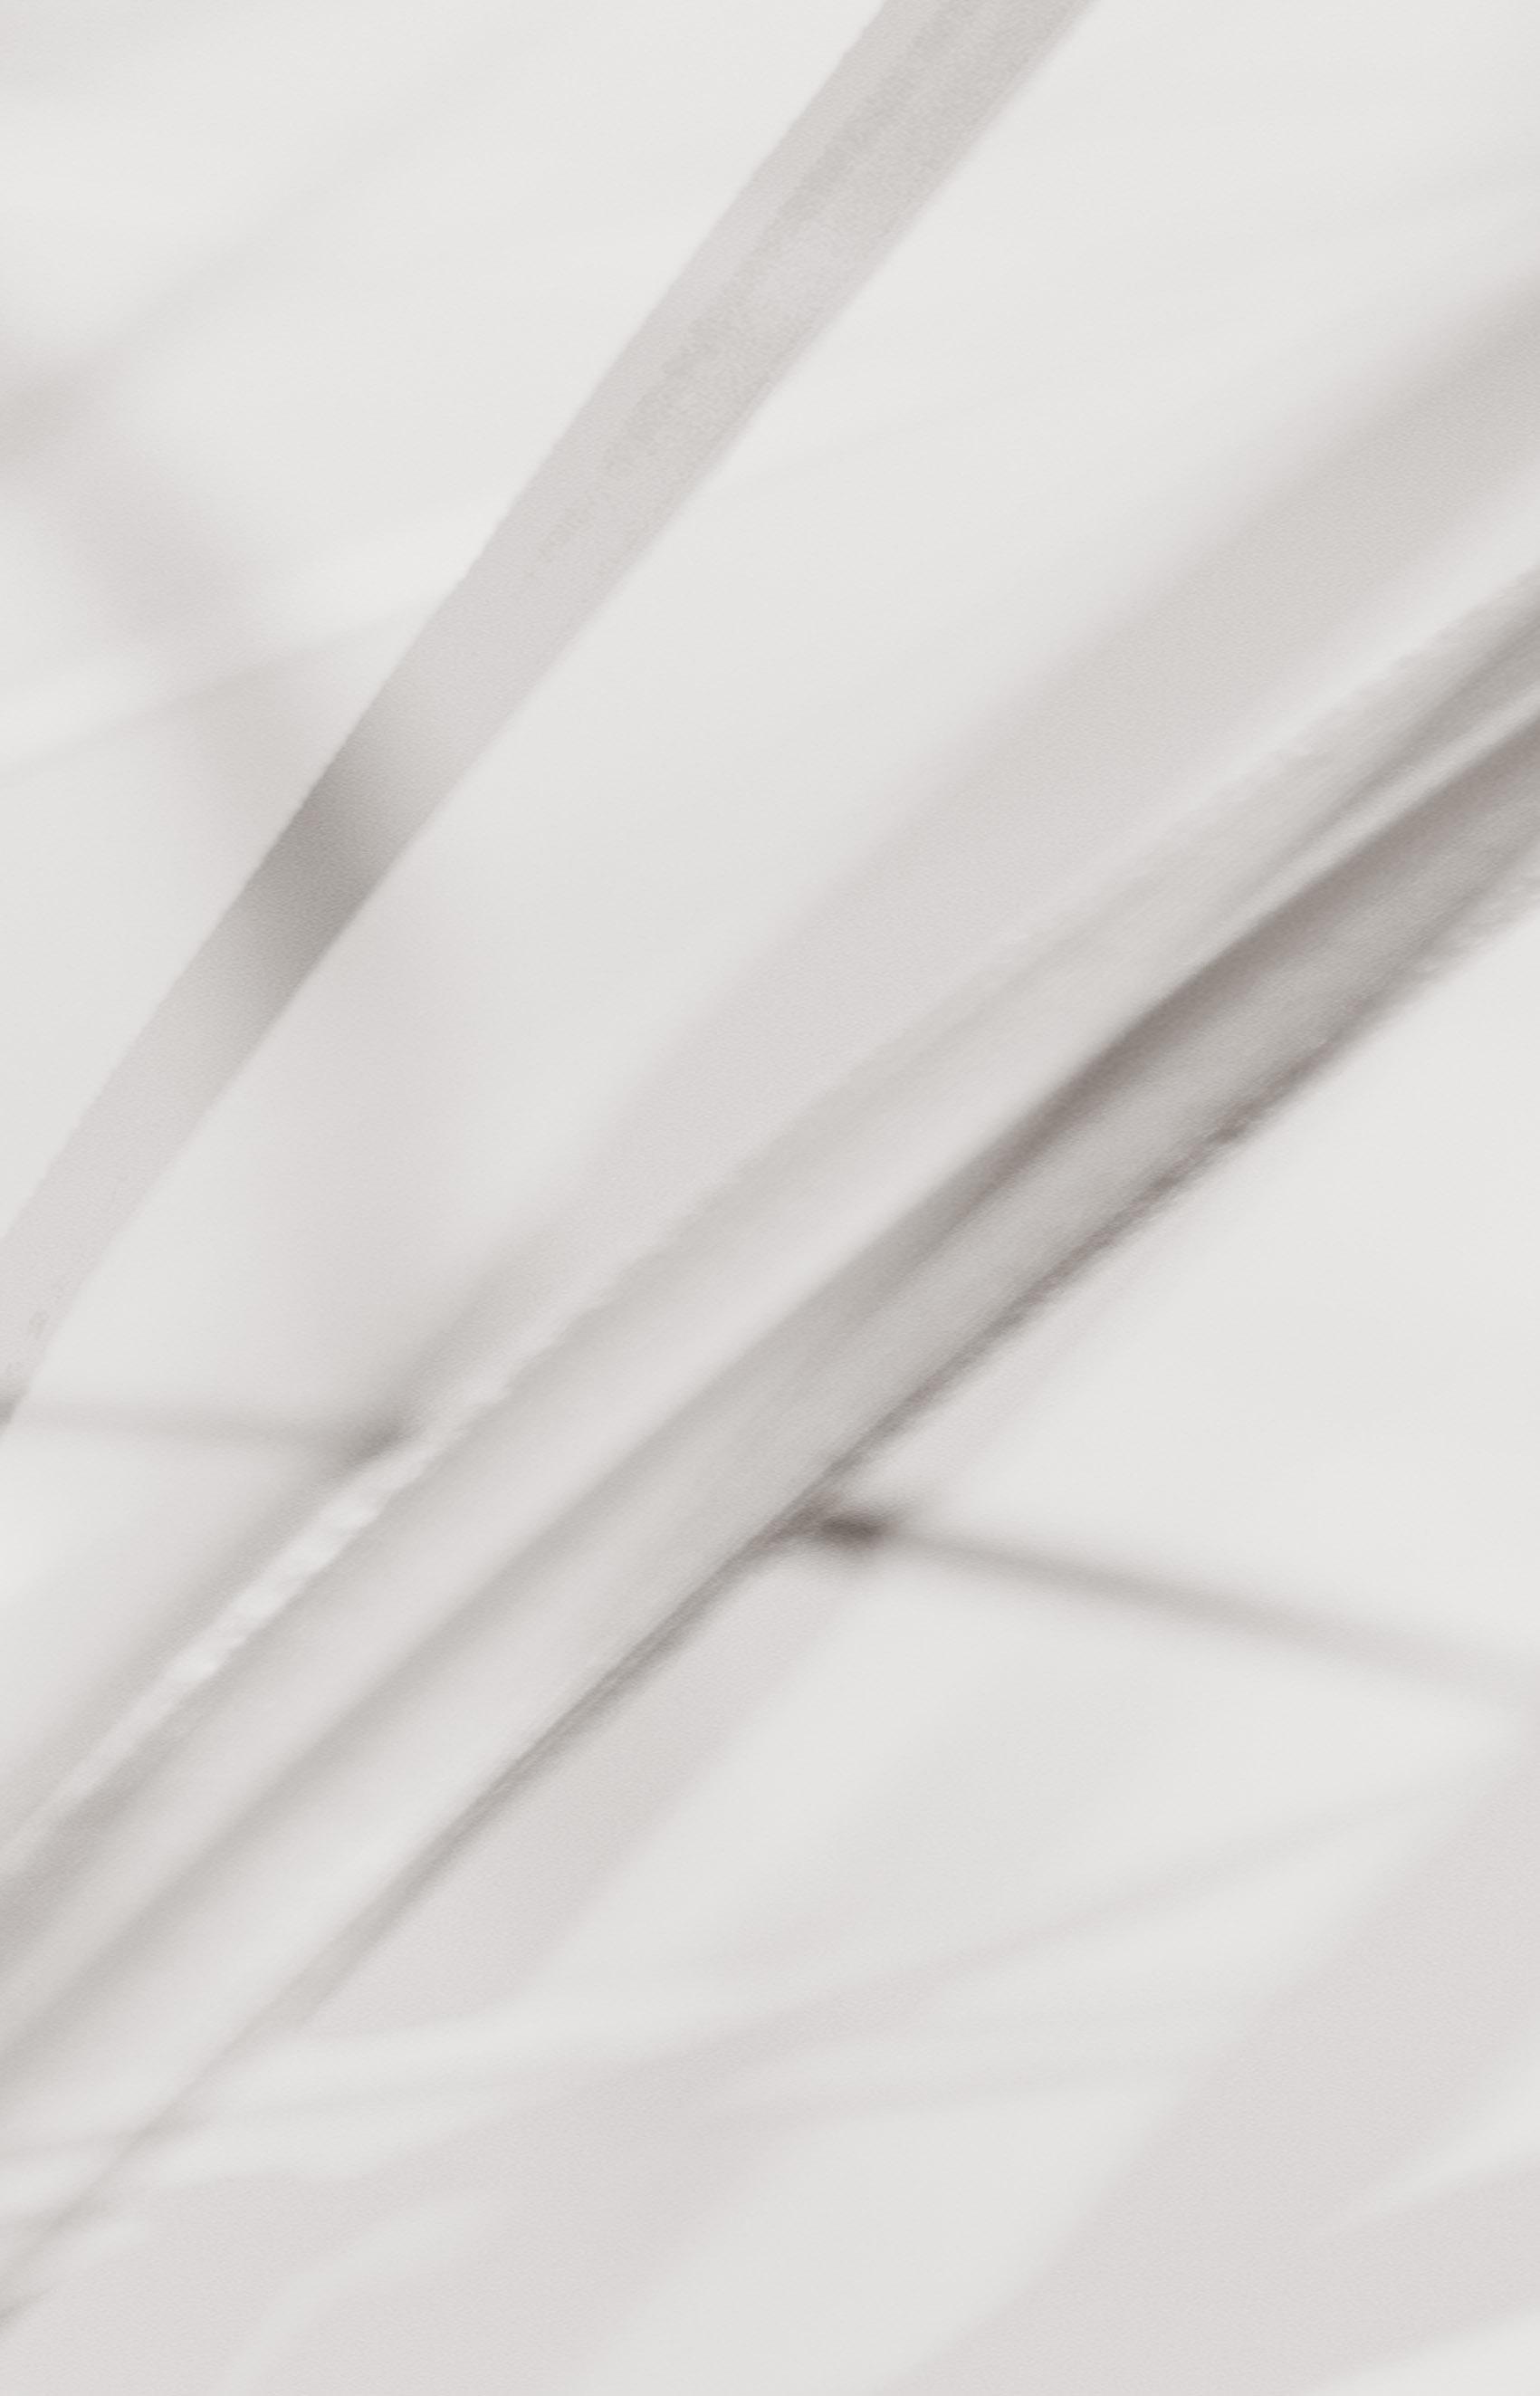 'SAND DUNES' sepia tone printed image on glass splashback - detail